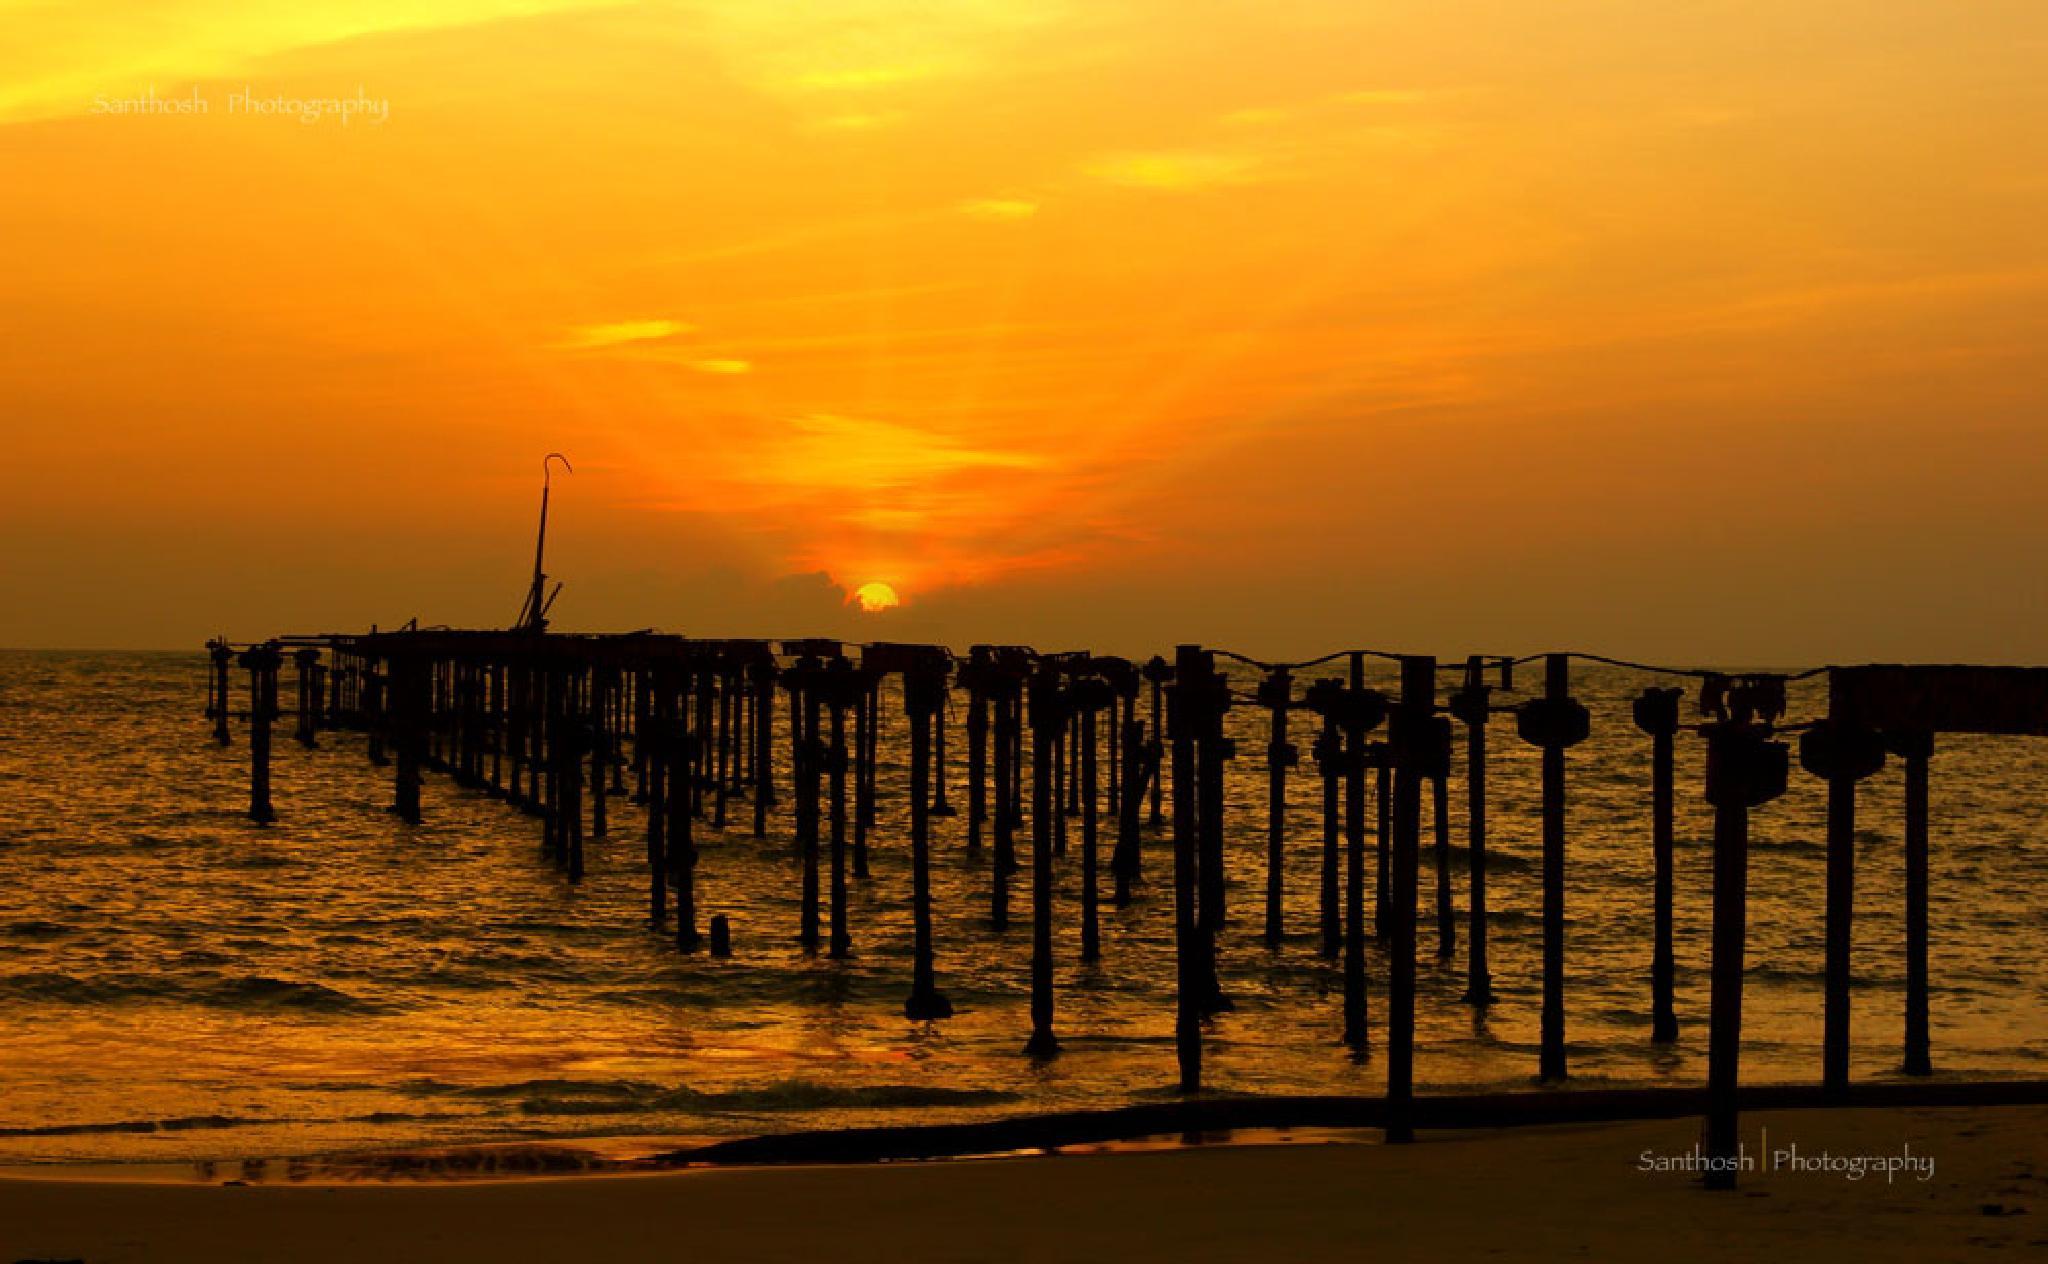 Sunset. by Punnaveran Santhosh